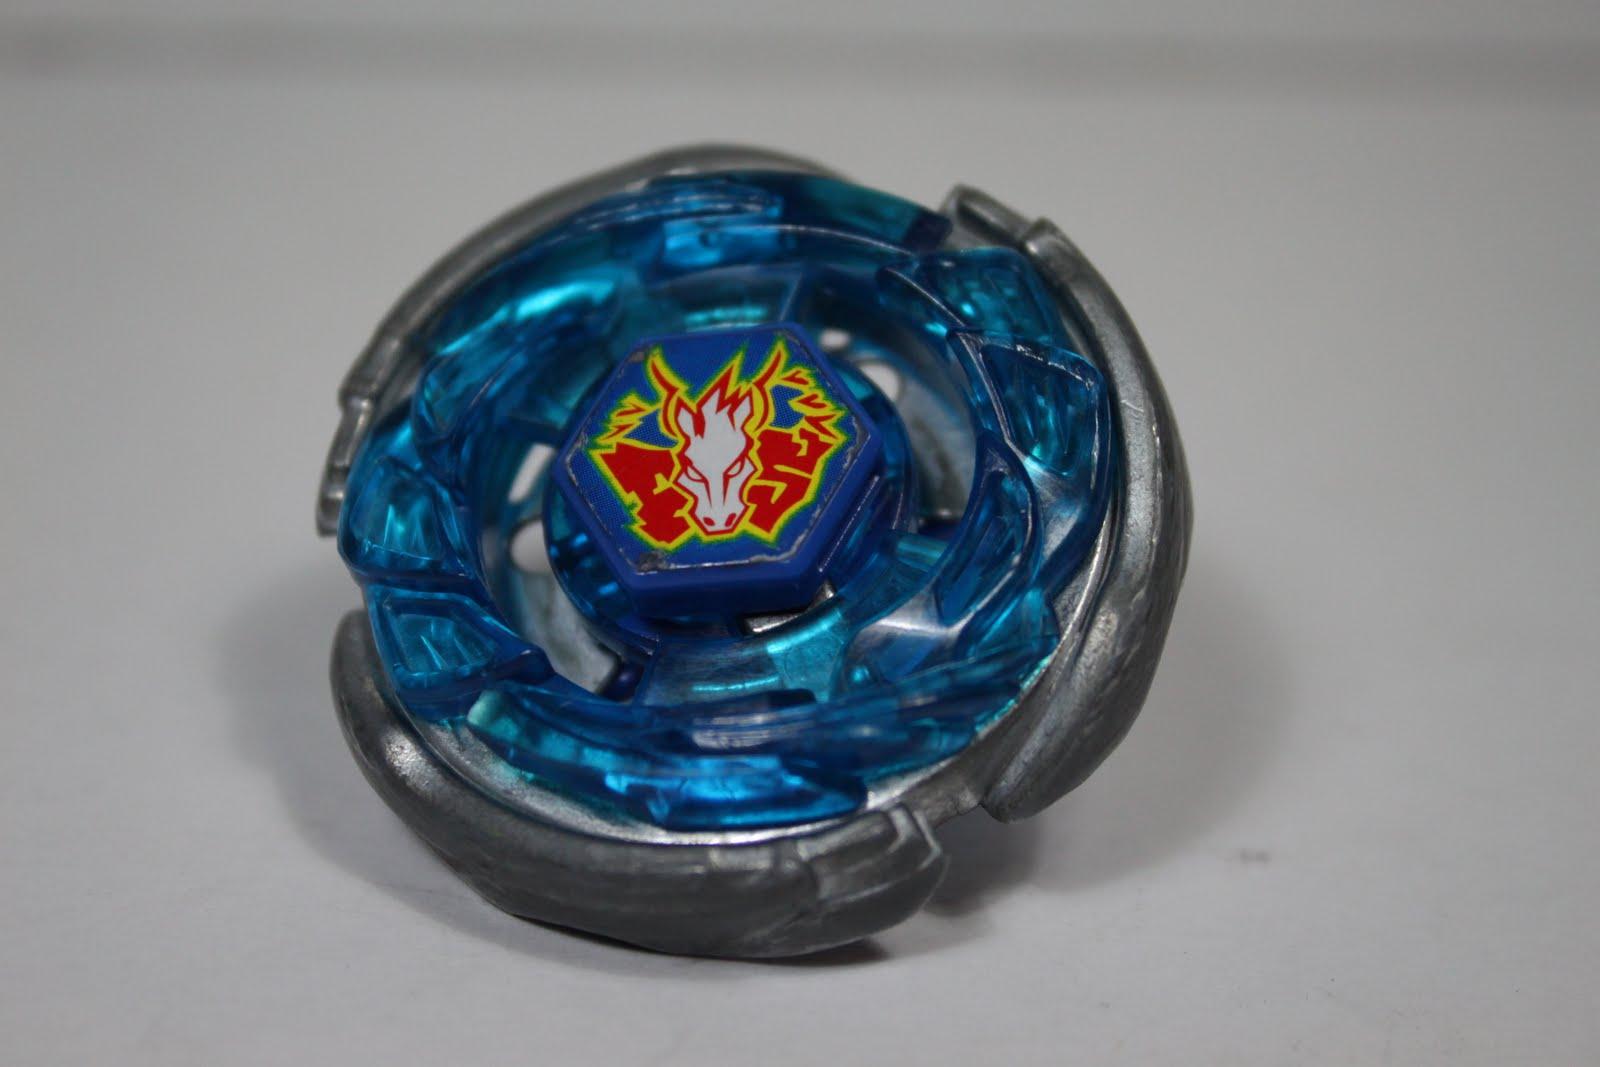 Beyblade toys 17 cool hd wallpaper animewp beyblade toys 17 cool hd wallpaper voltagebd Images